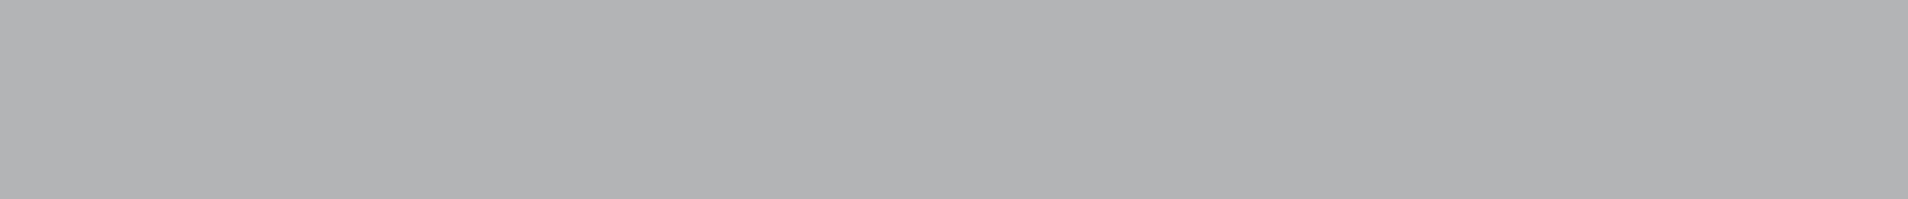 LINEA GRIS.jpg